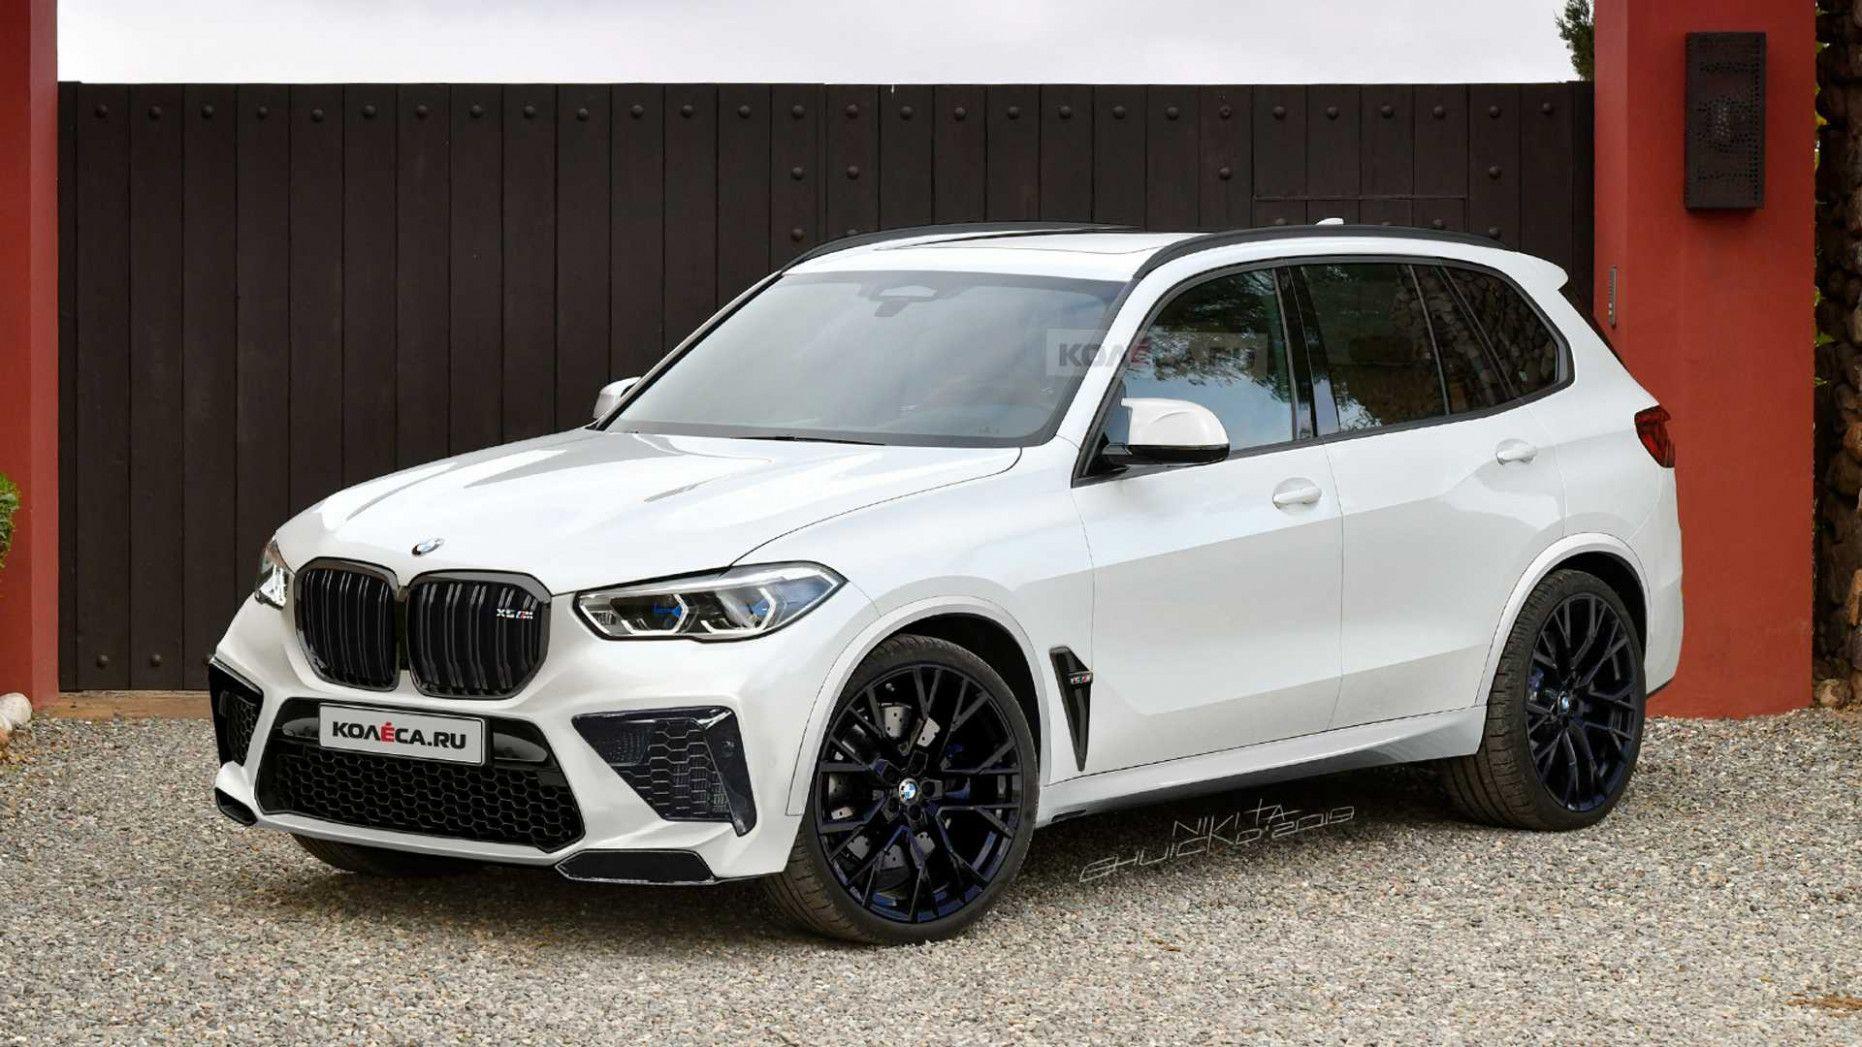 2020 Next Gen BMW X5 Suv Model